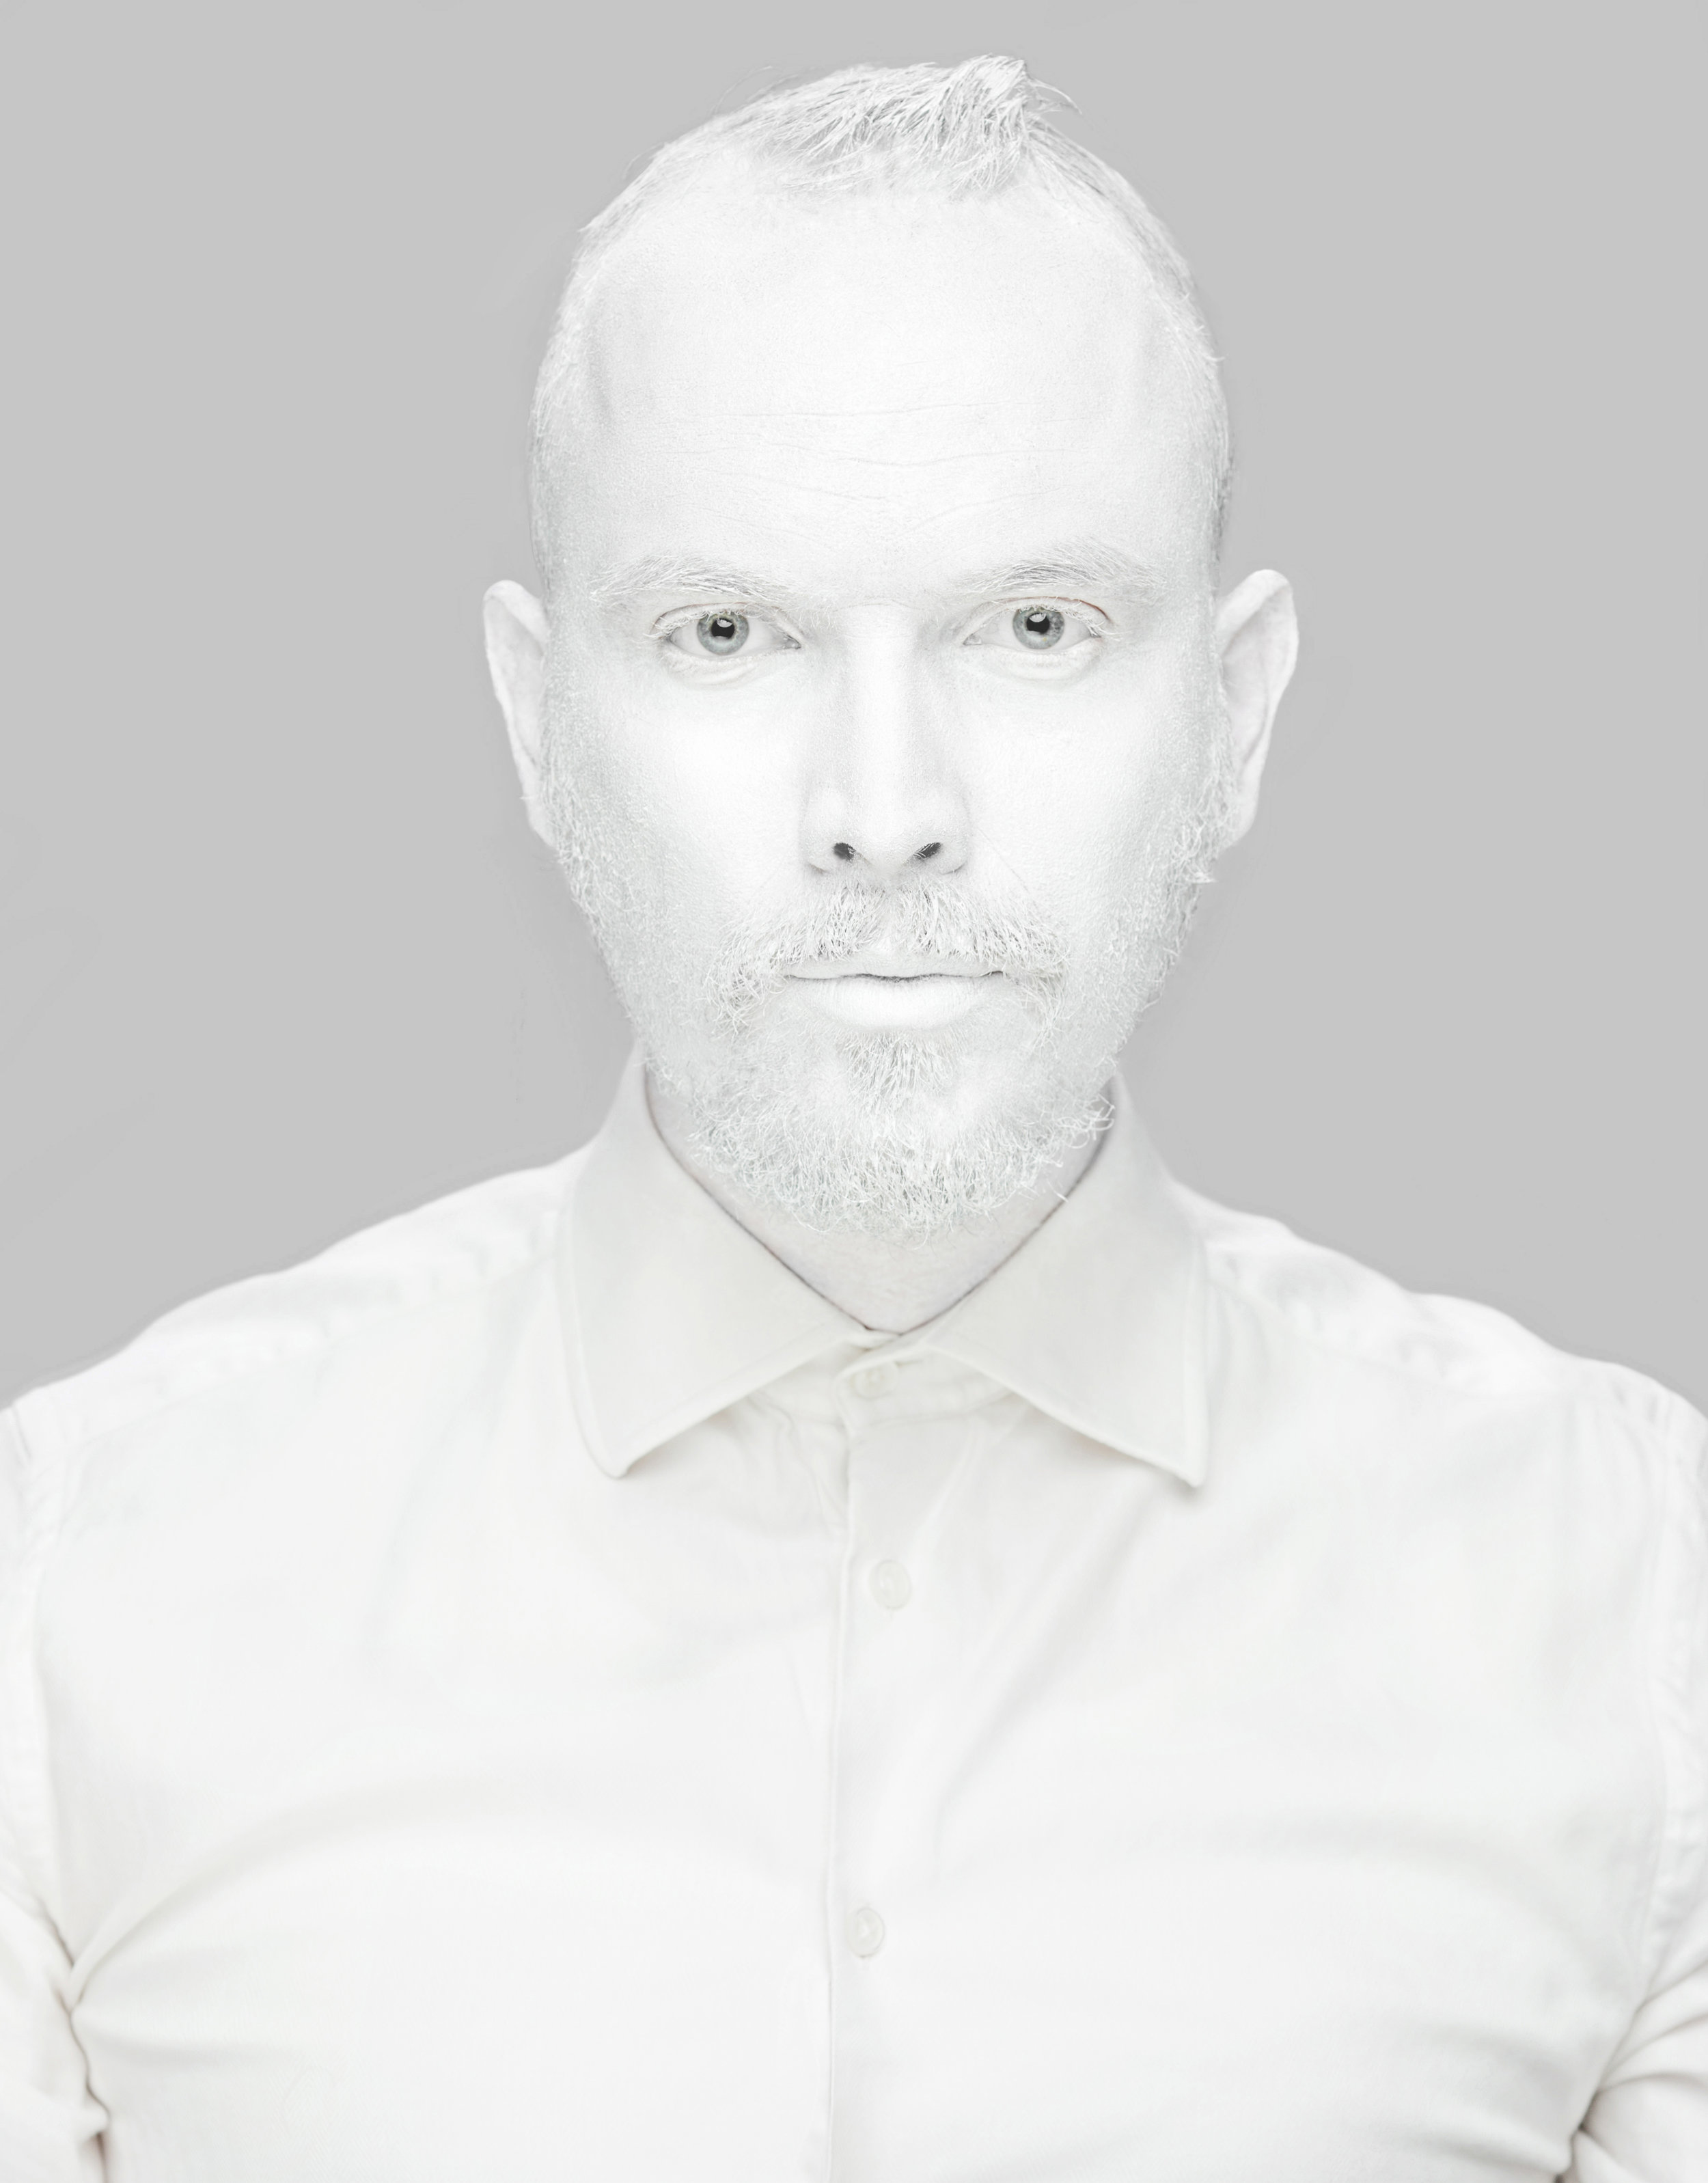 Tadao_Cern.jpg